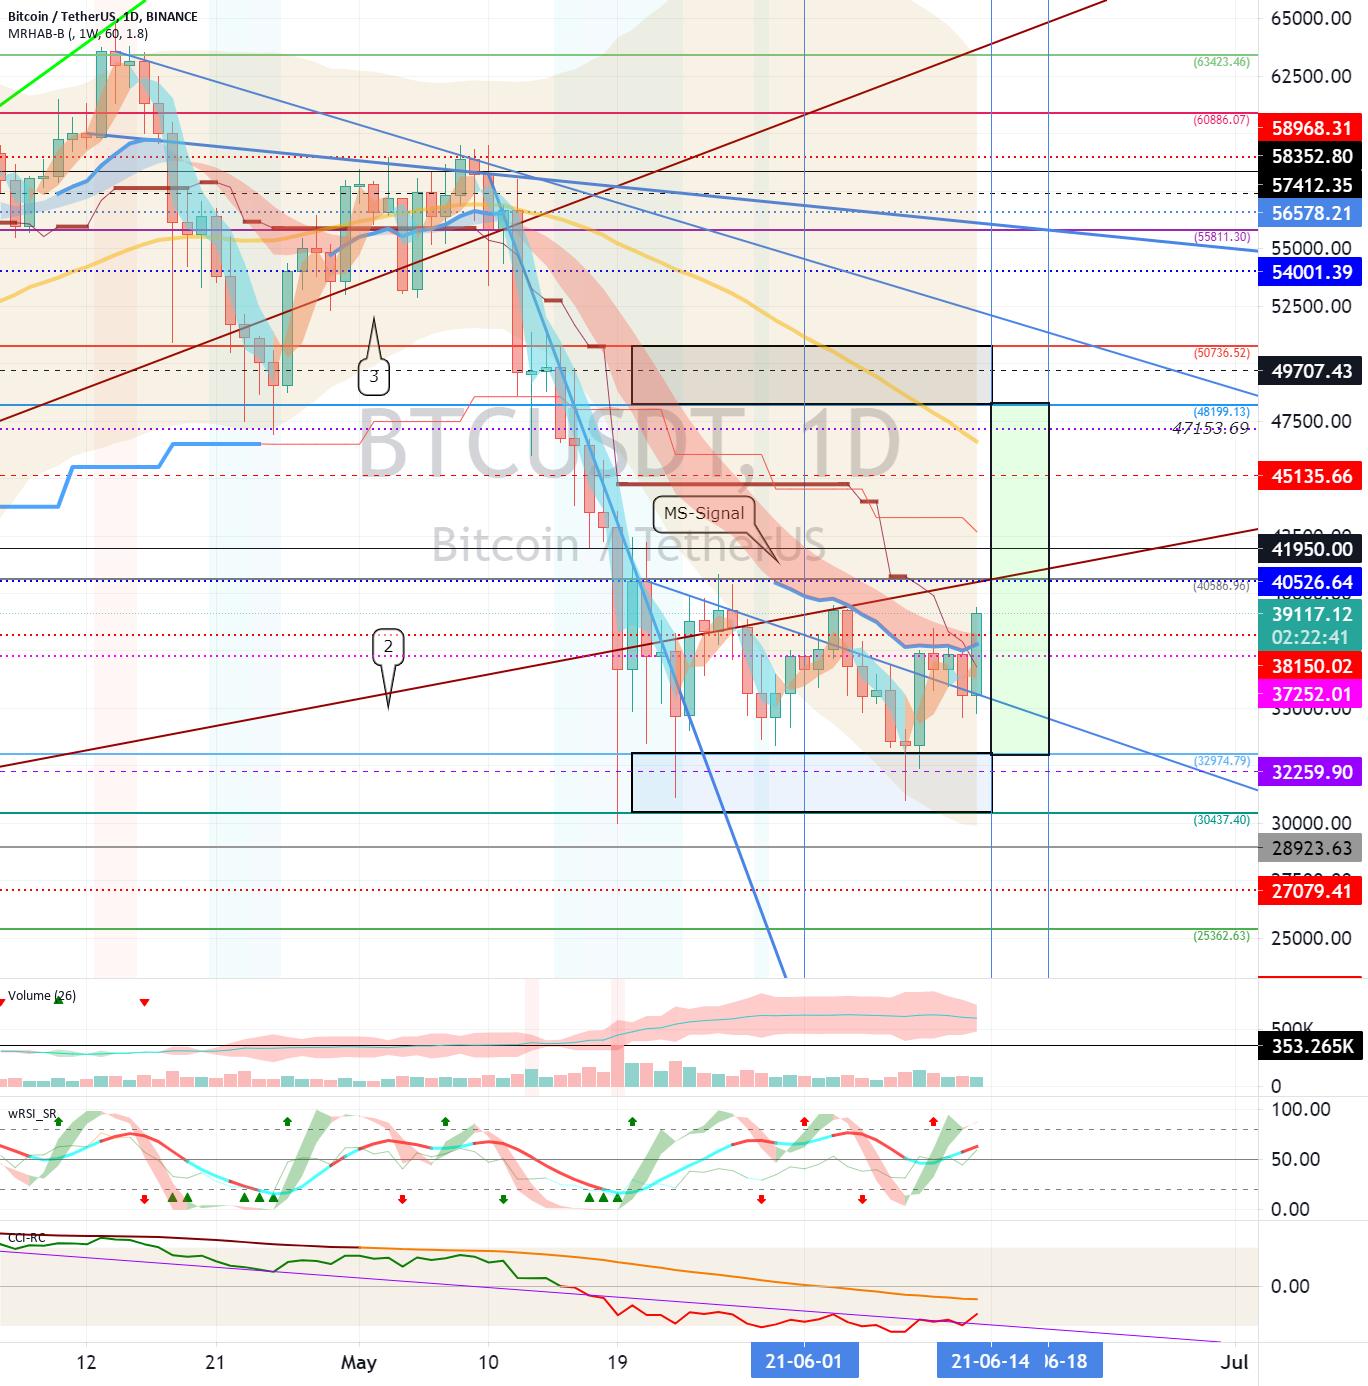 Bitcoin (BTC) - June 14 (volatility period around June 14-18)